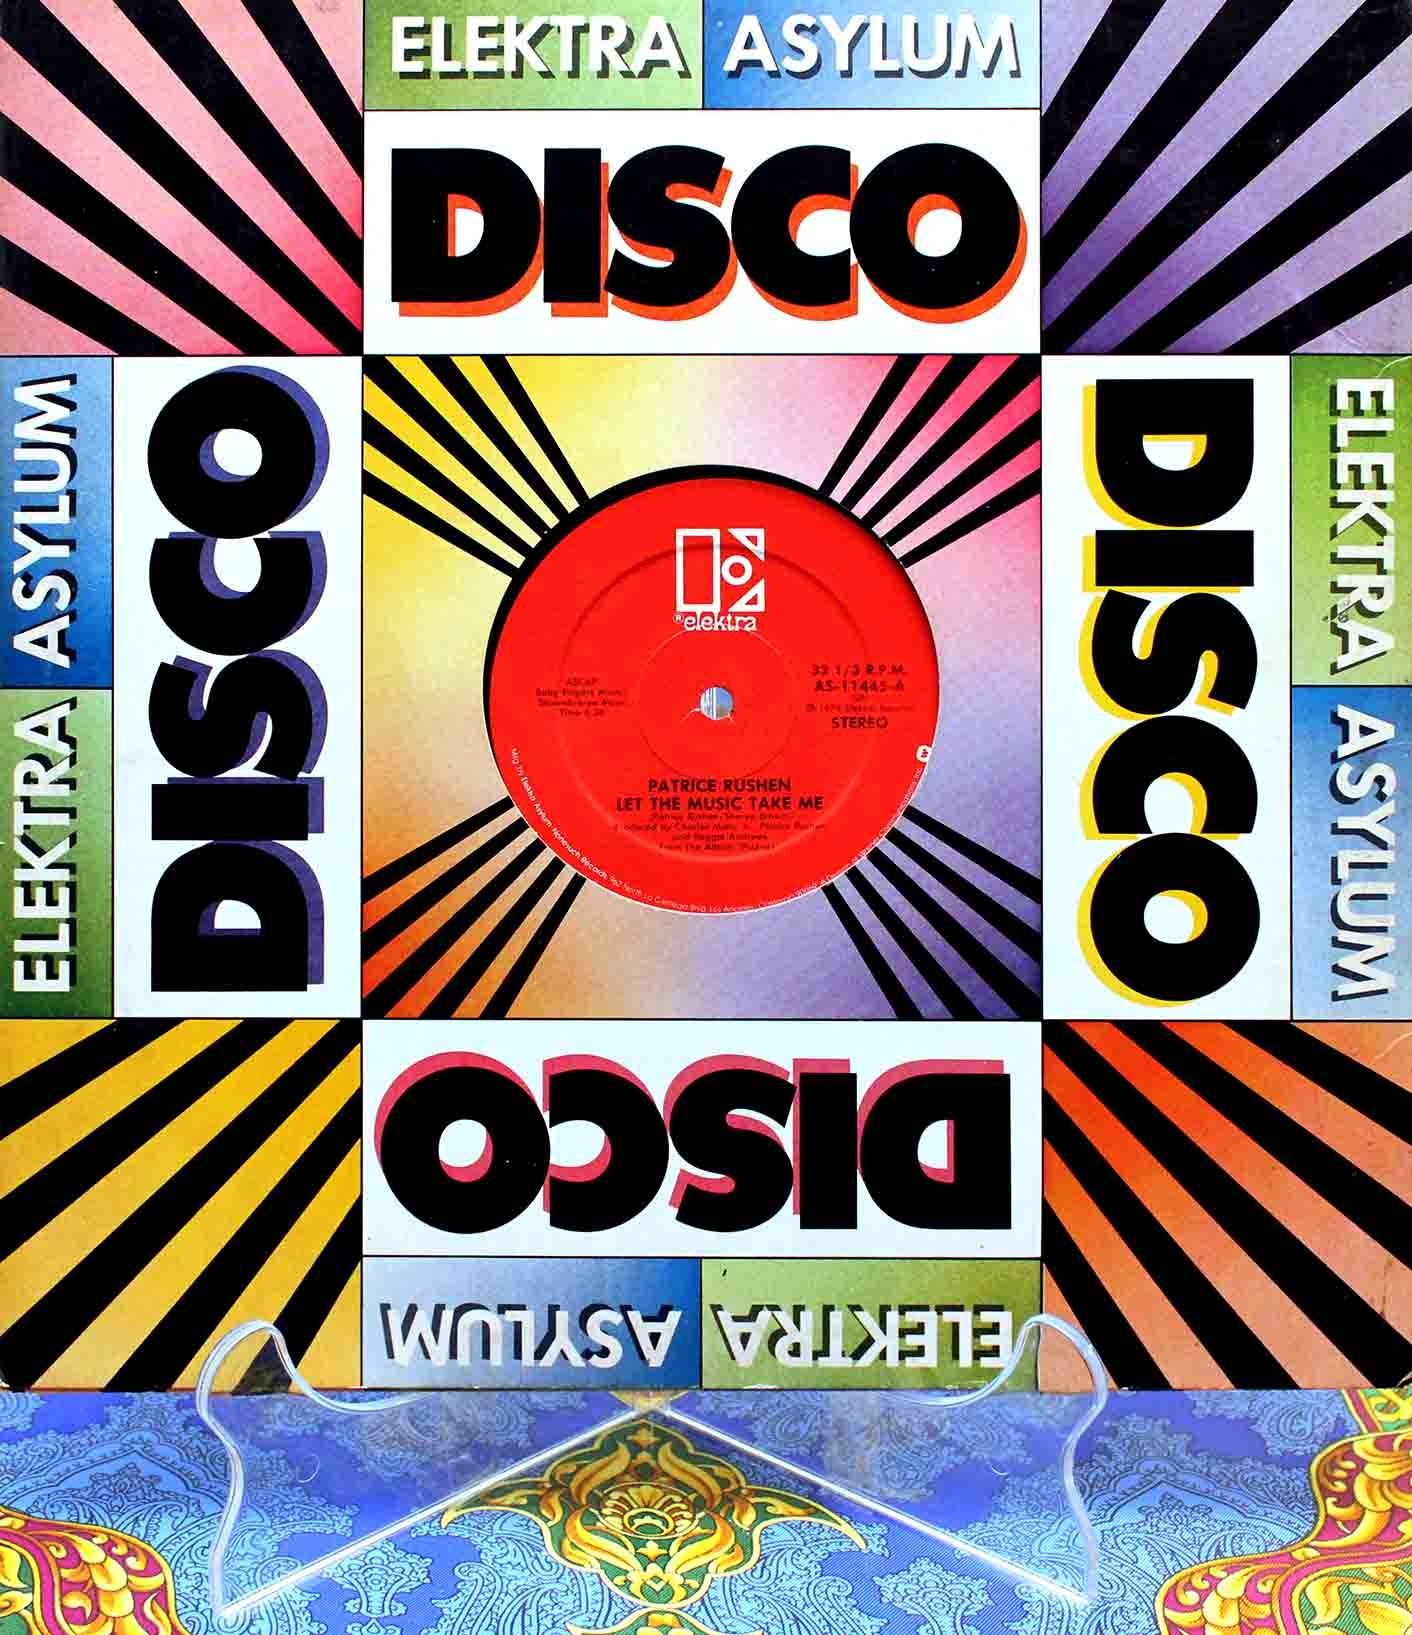 Patrice Rushen – Let The Music Take Me 01